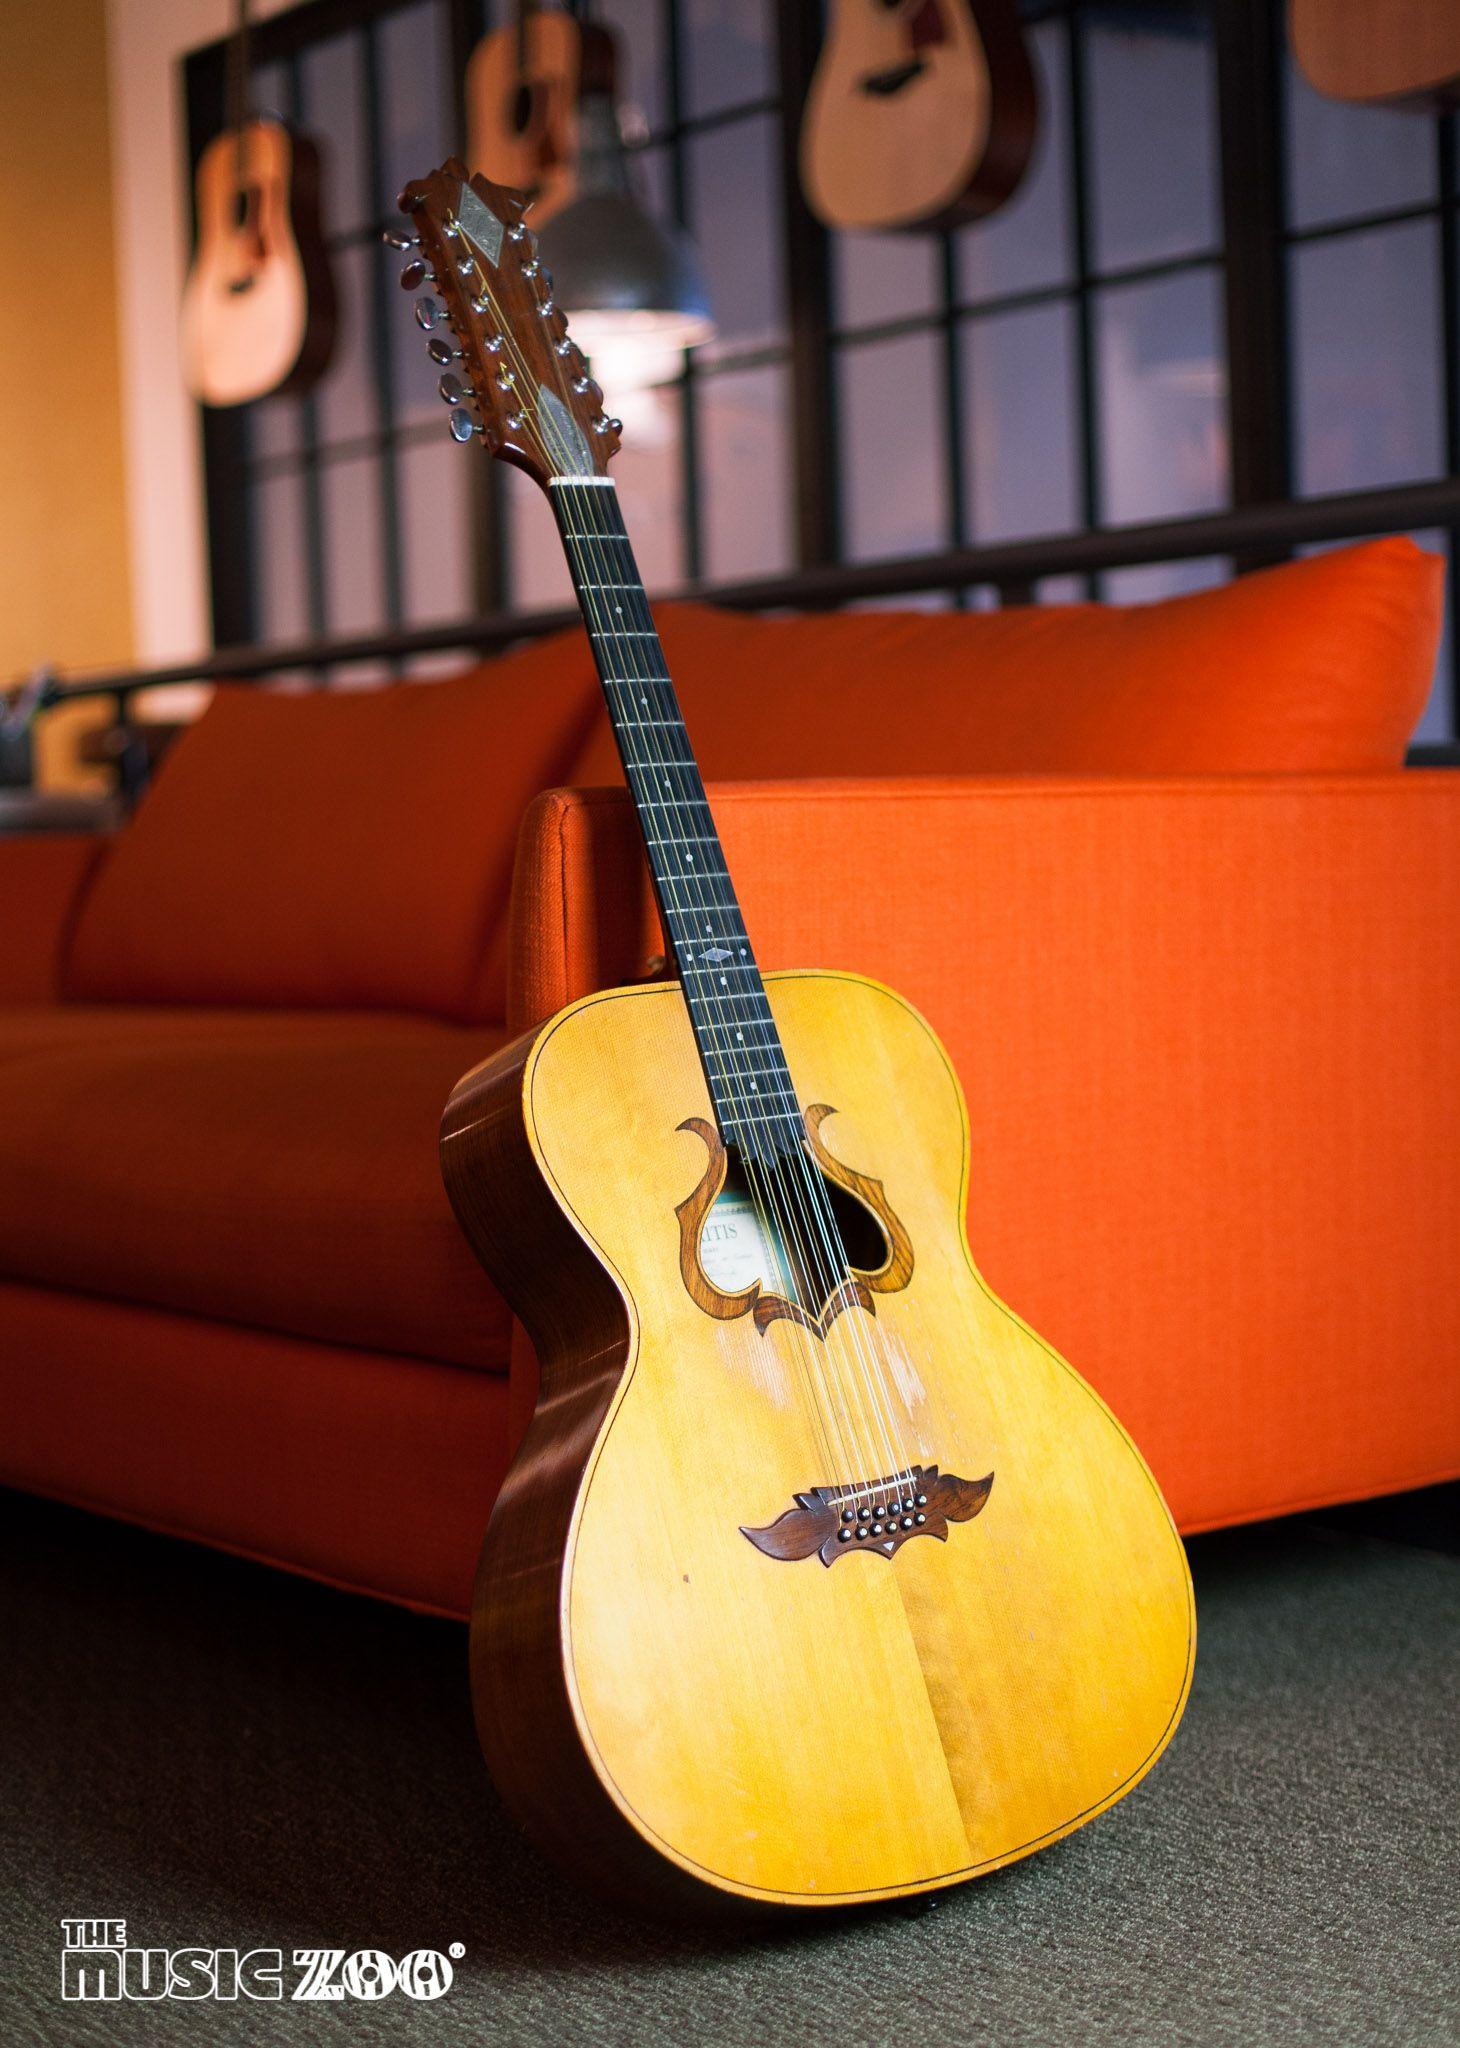 Out Of The Case Vintage Zemaitis Acoustic Guitars Guitar Acoustic Guitar Notes Taylor Guitars Acoustic